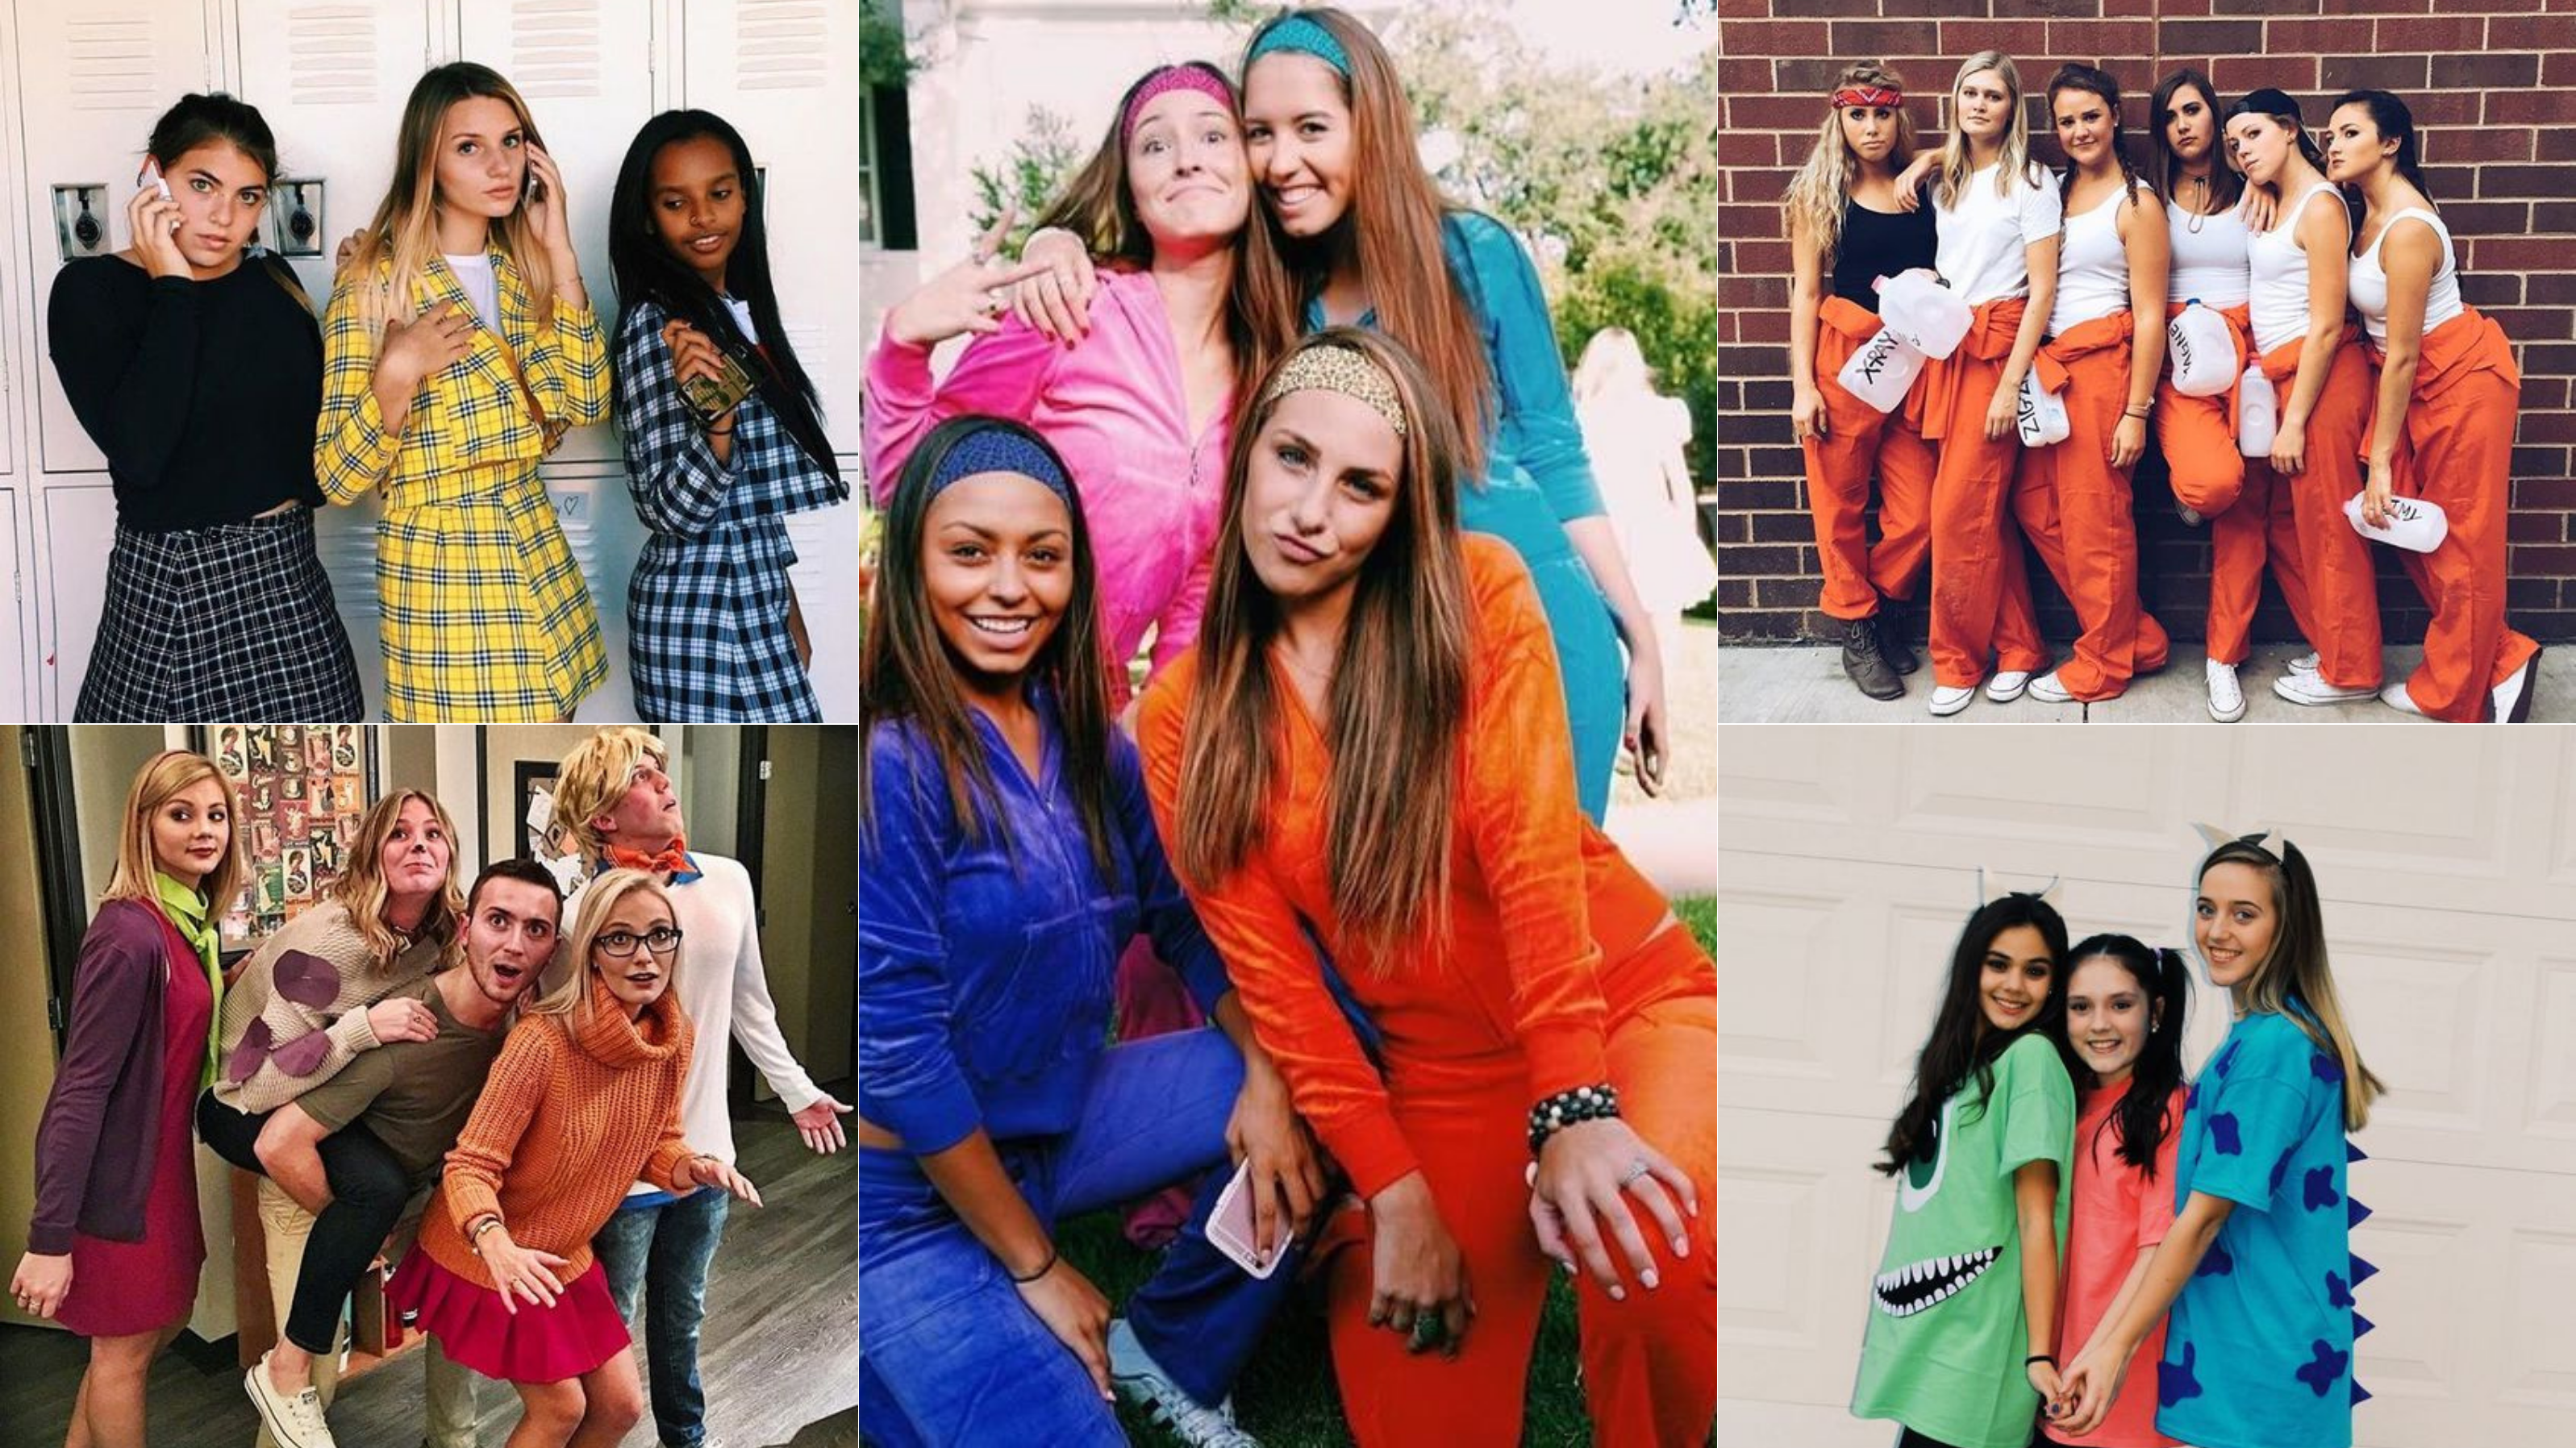 23 Spooky Group Halloween Costume Ideas Simply Allison